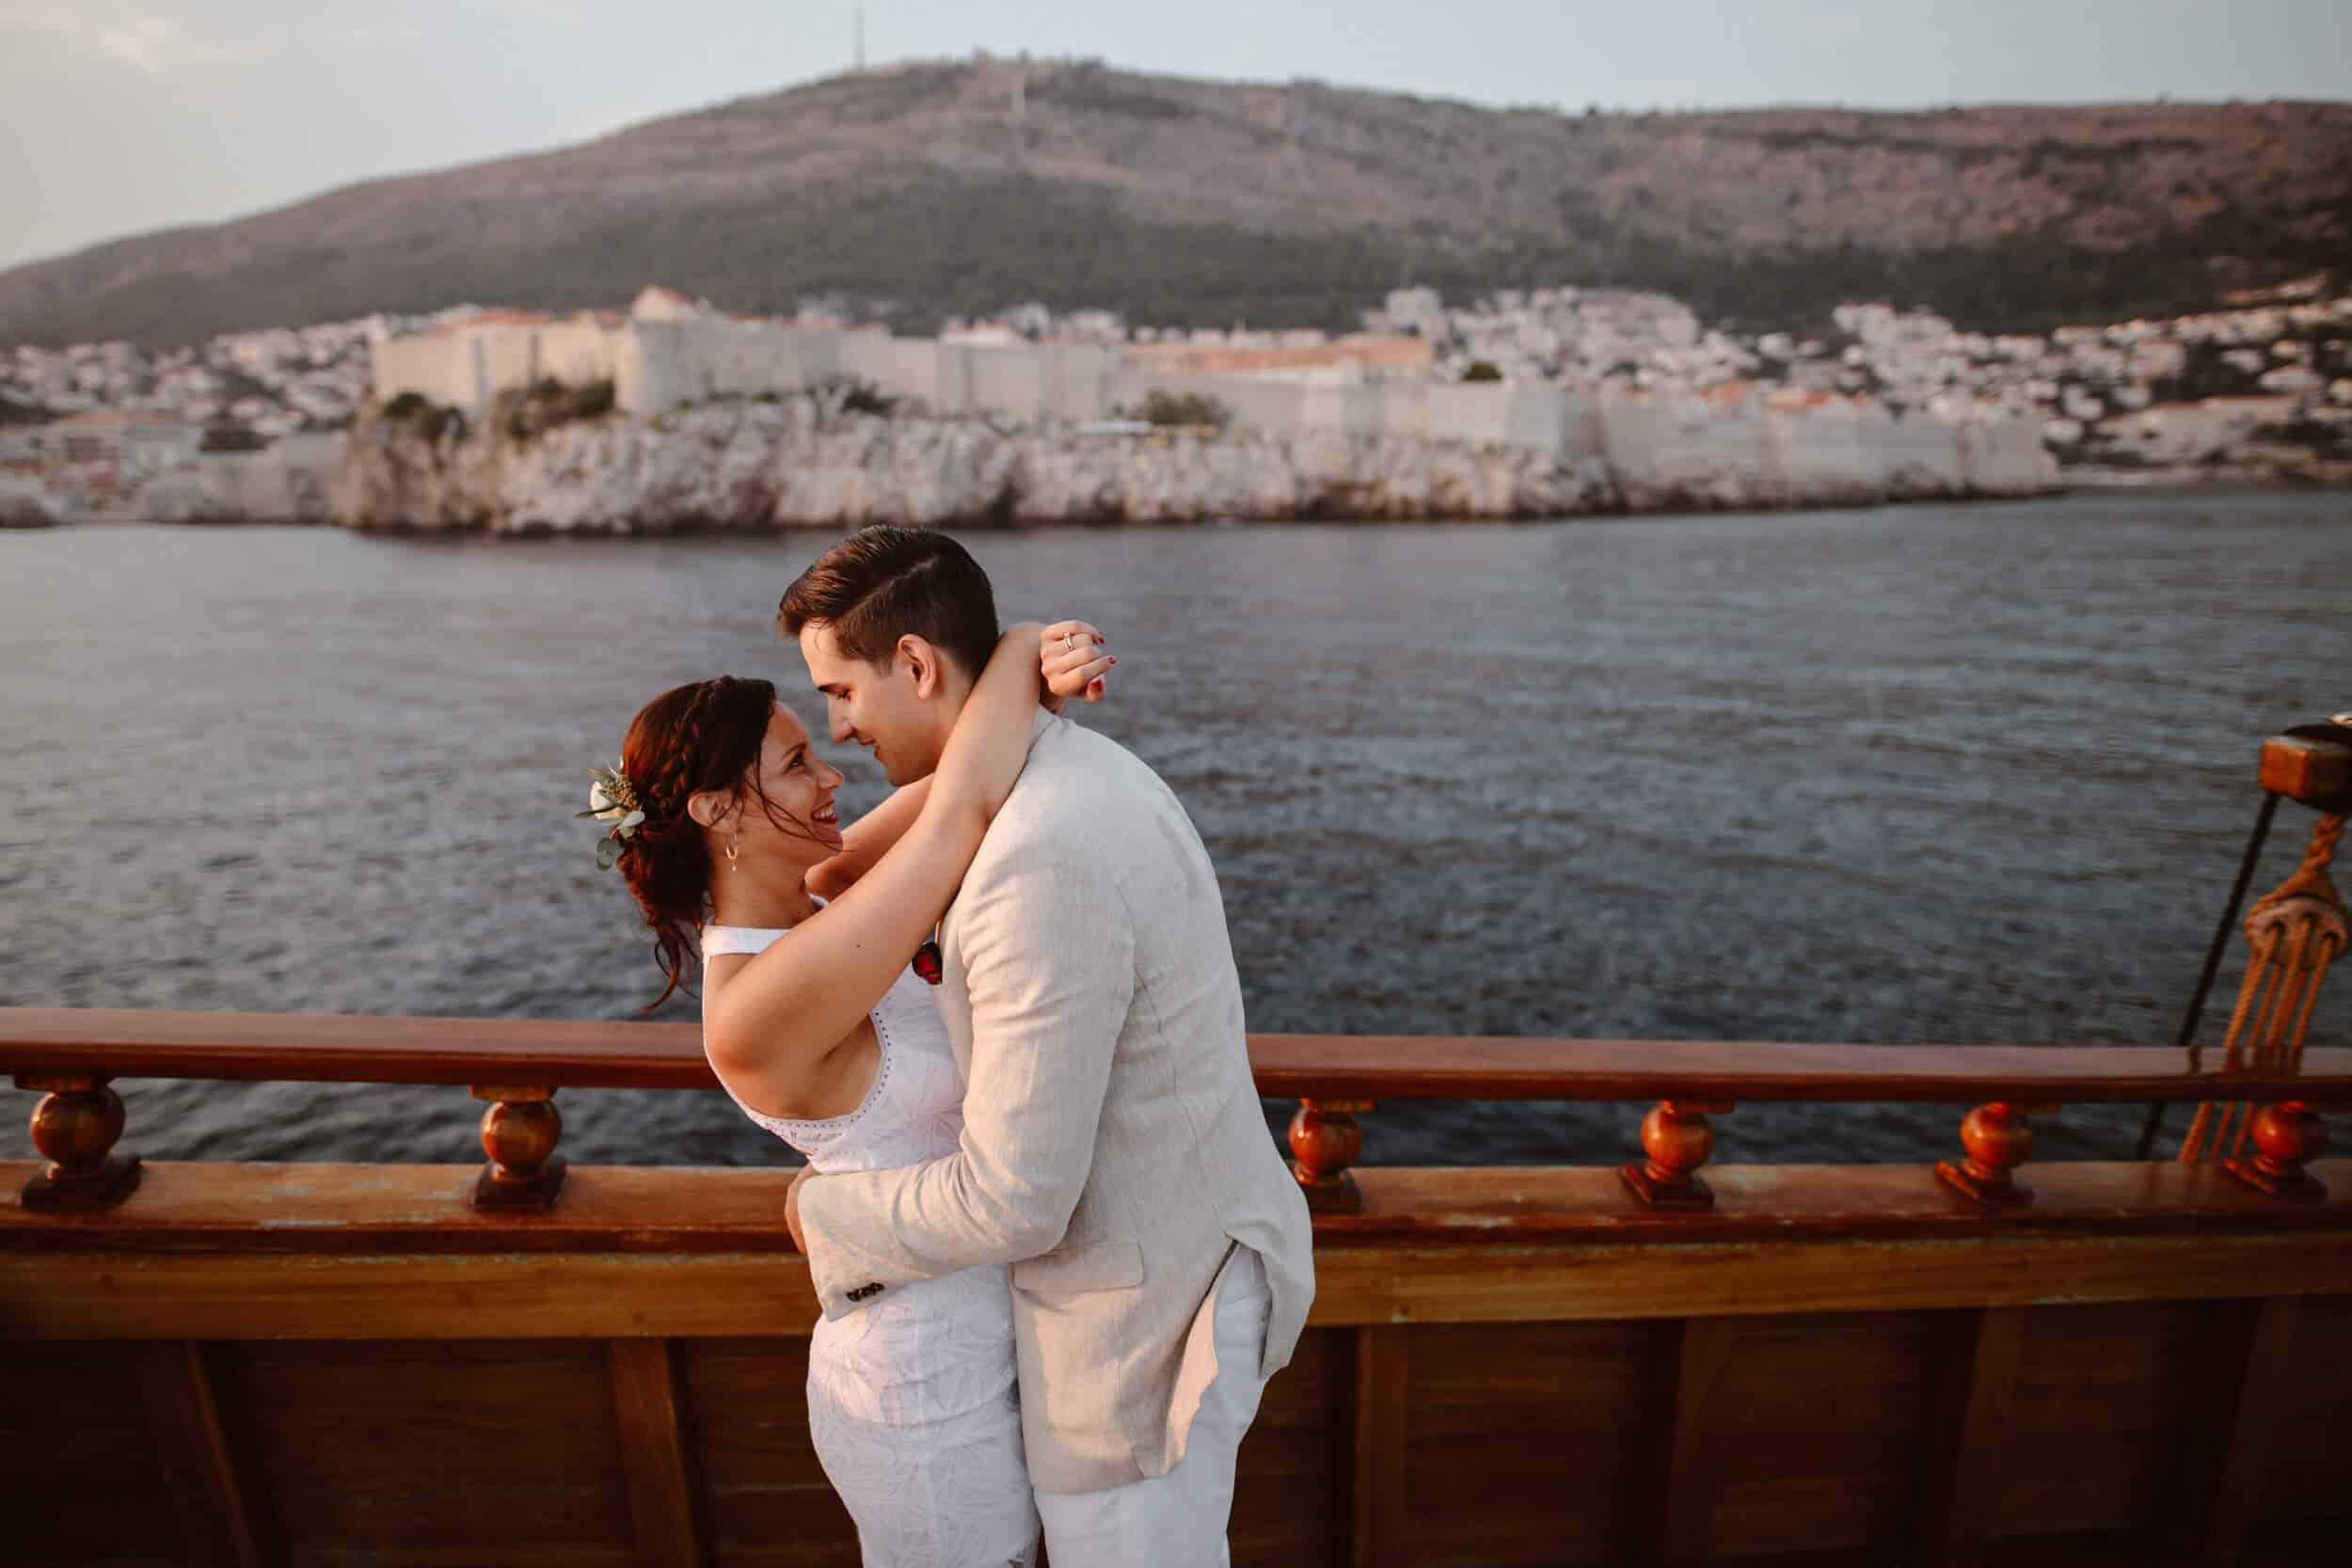 Dubrovnik karaka boat elopement matea stephan 16 | Croatia Elopement Photographer and Videographer